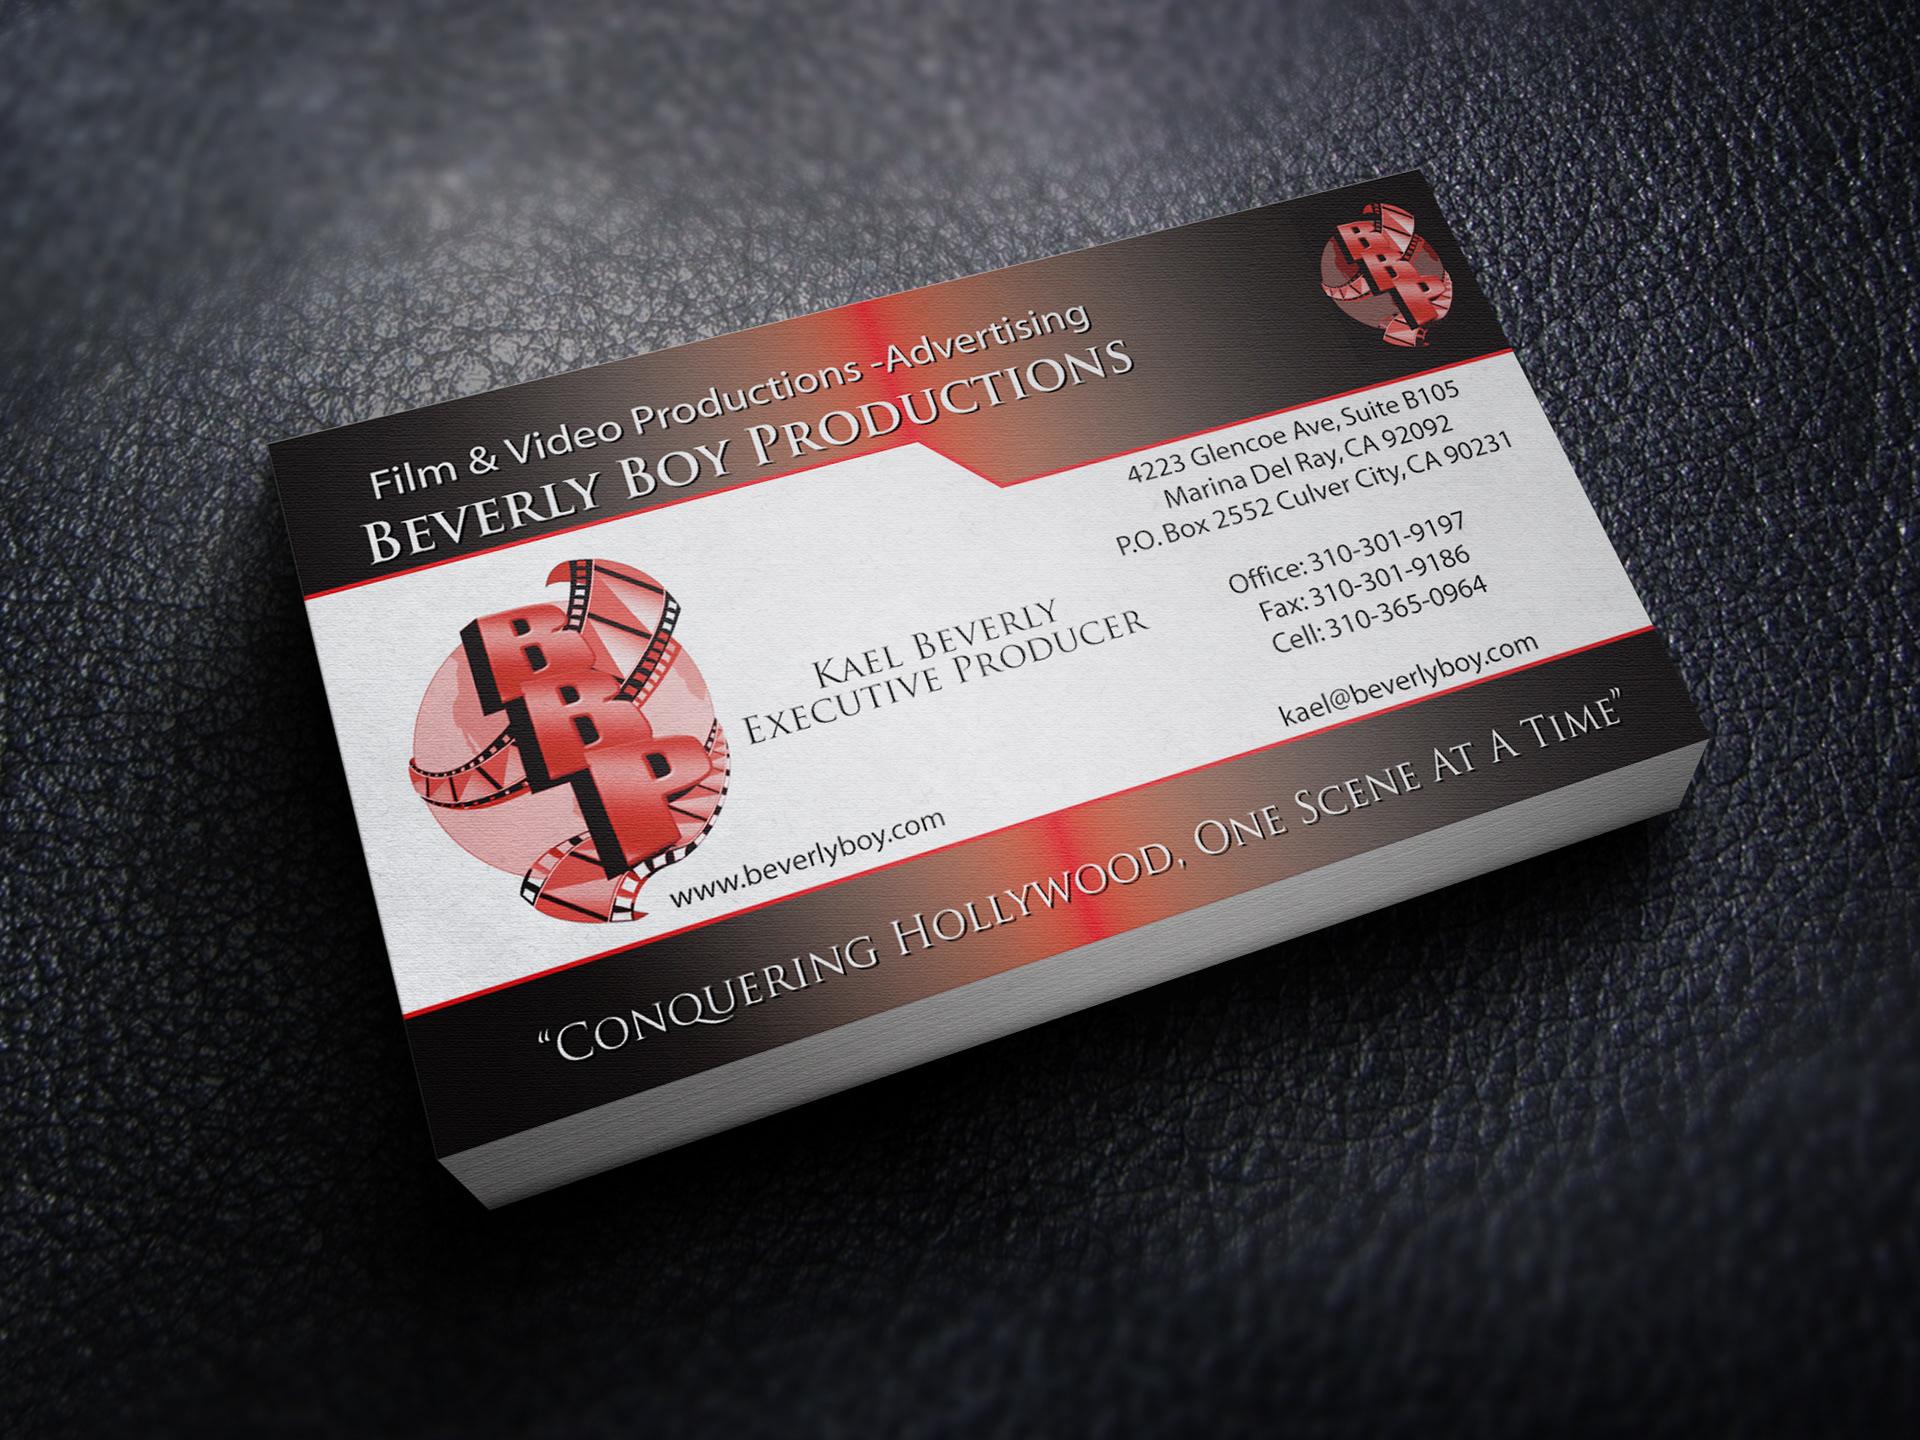 Roman warren design business cards business cards colourmoves Image collections